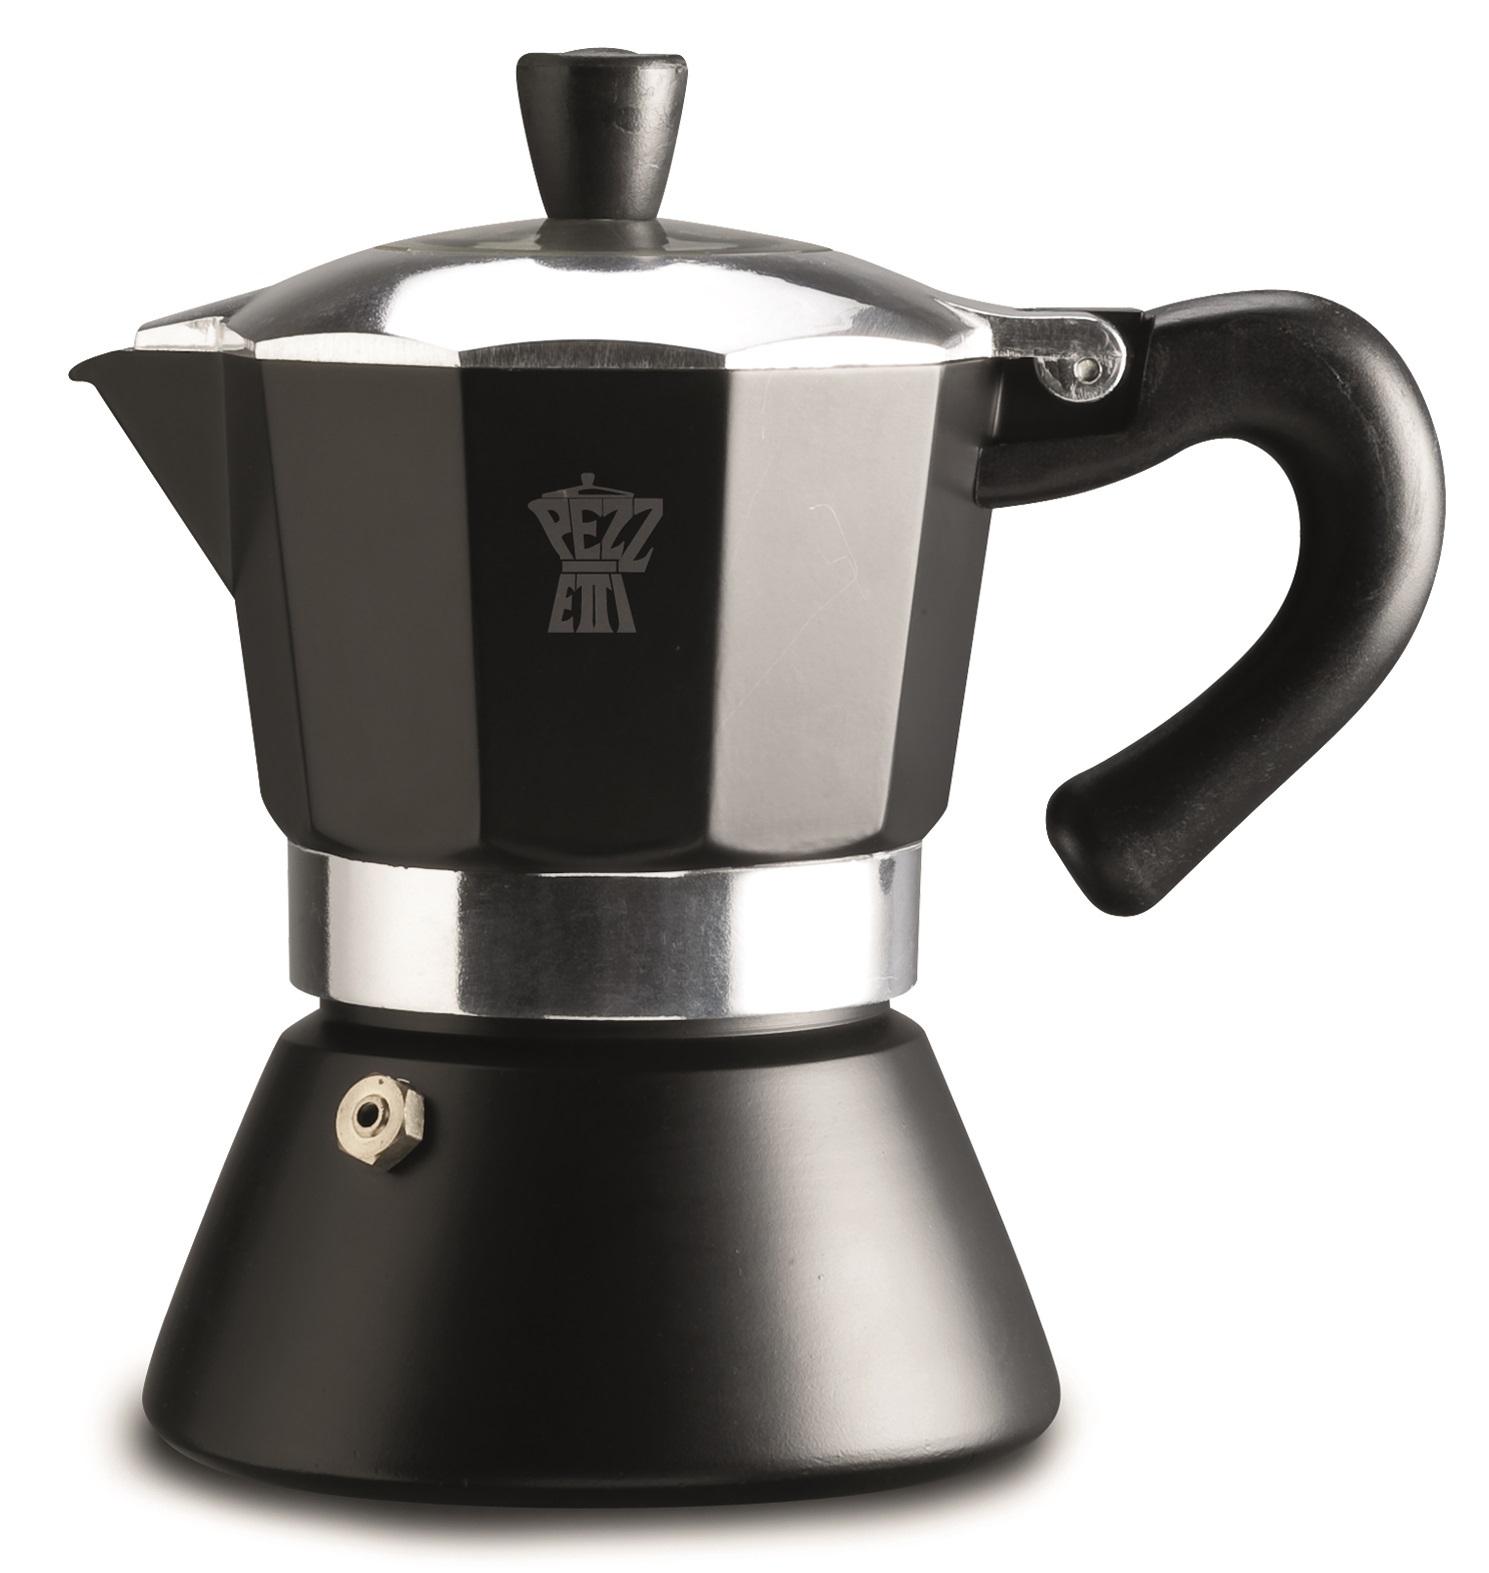 pezzetti bellexpress black induction coffee maker 6c at. Black Bedroom Furniture Sets. Home Design Ideas